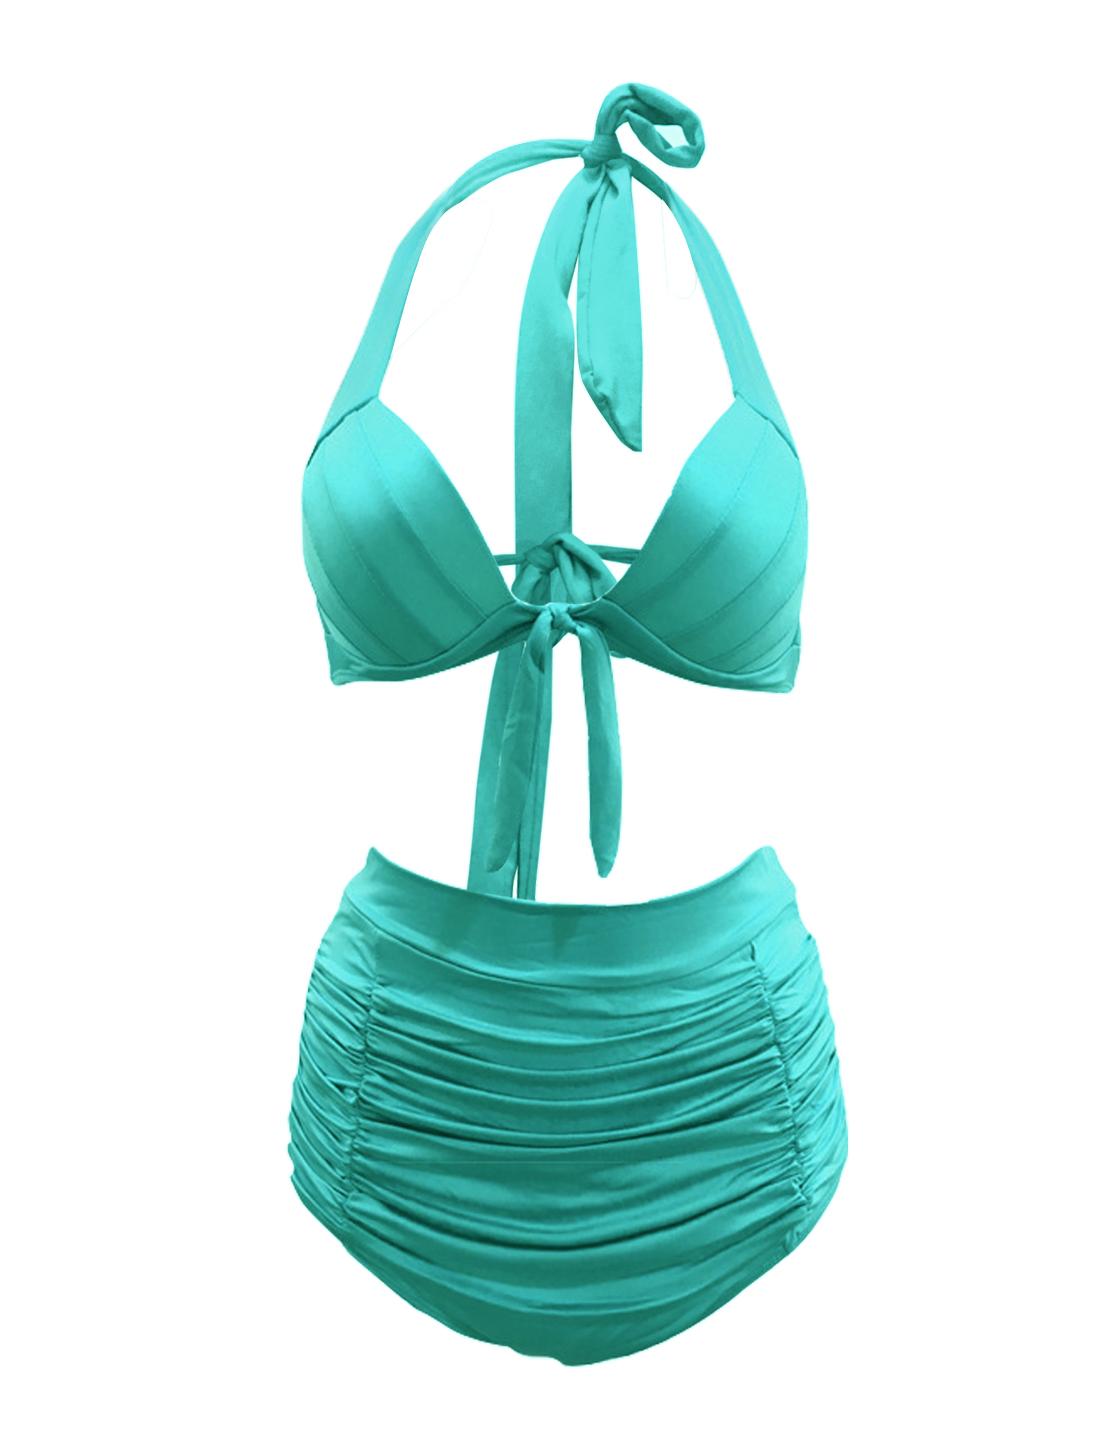 Retro Women 50s Halter High Waist Bikini Vintage Swimsuit Bathing Suit Peacock Blue S